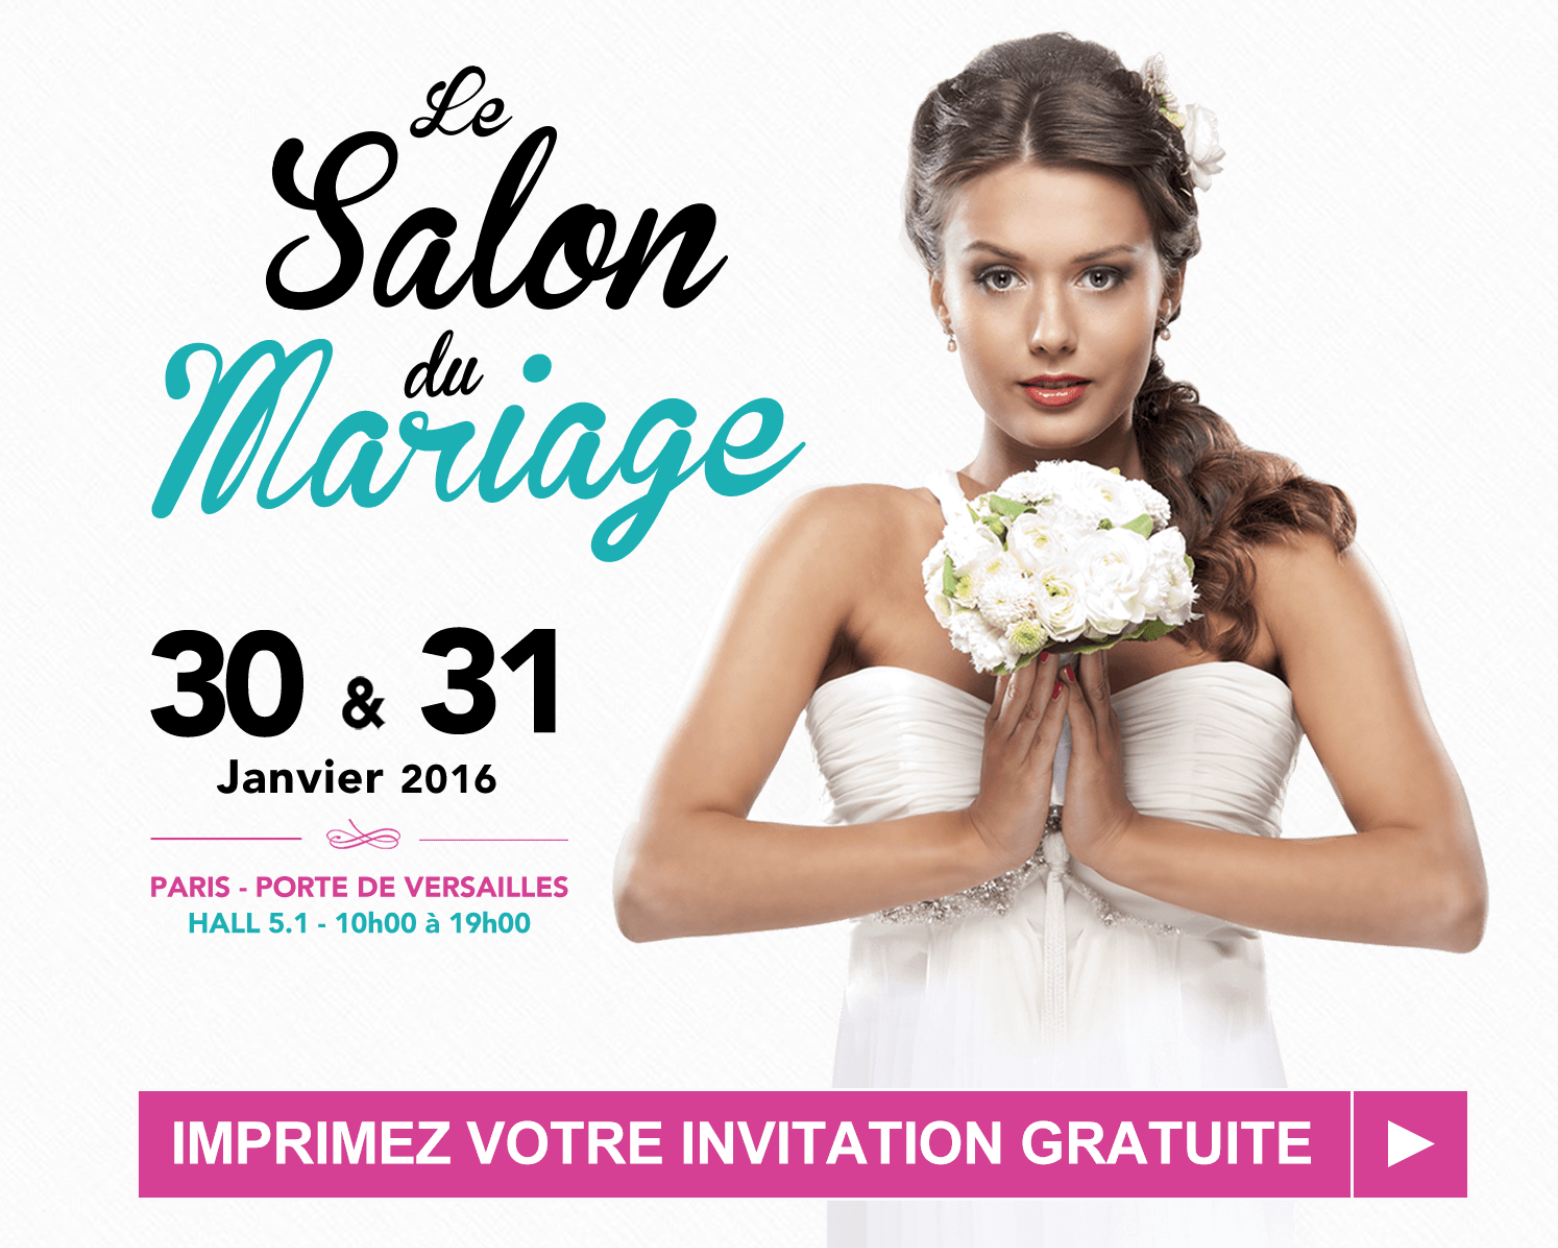 Salon du Mariage 30 & 31 Janvier 2016